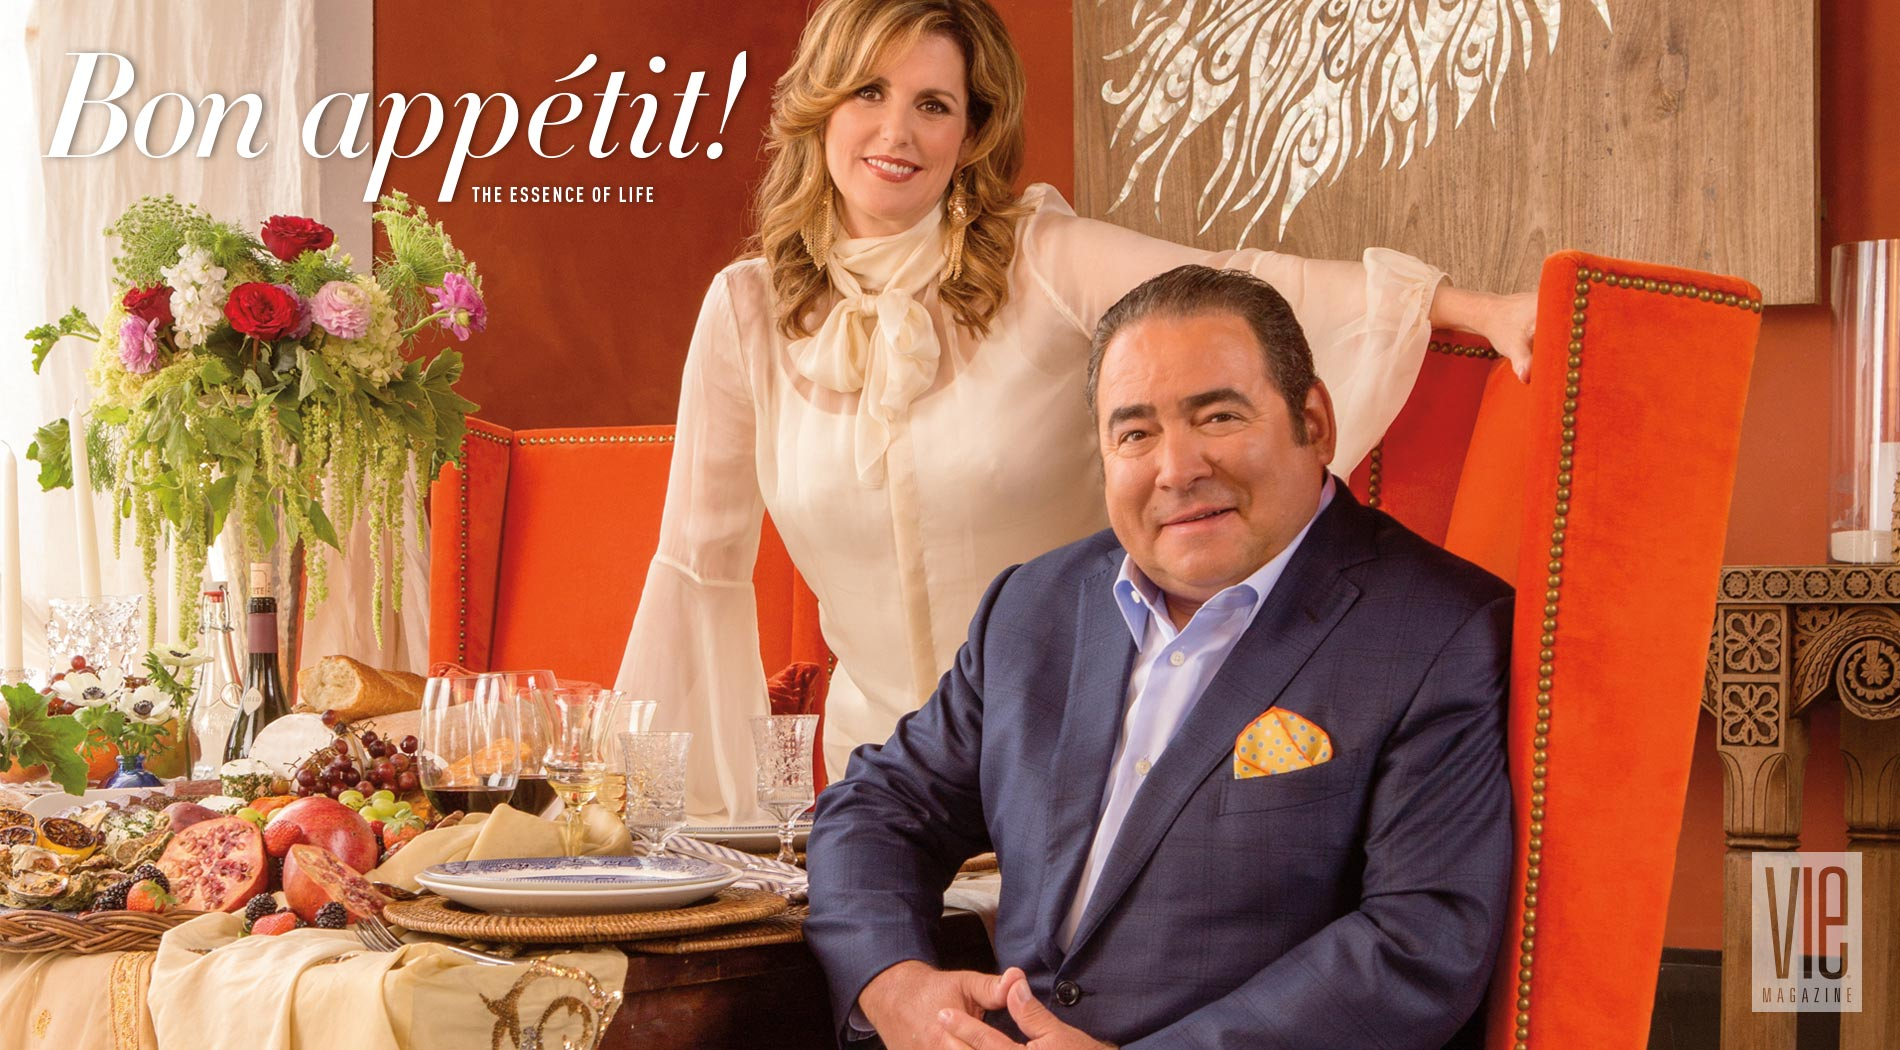 VIE Magazine - Bon Appetit